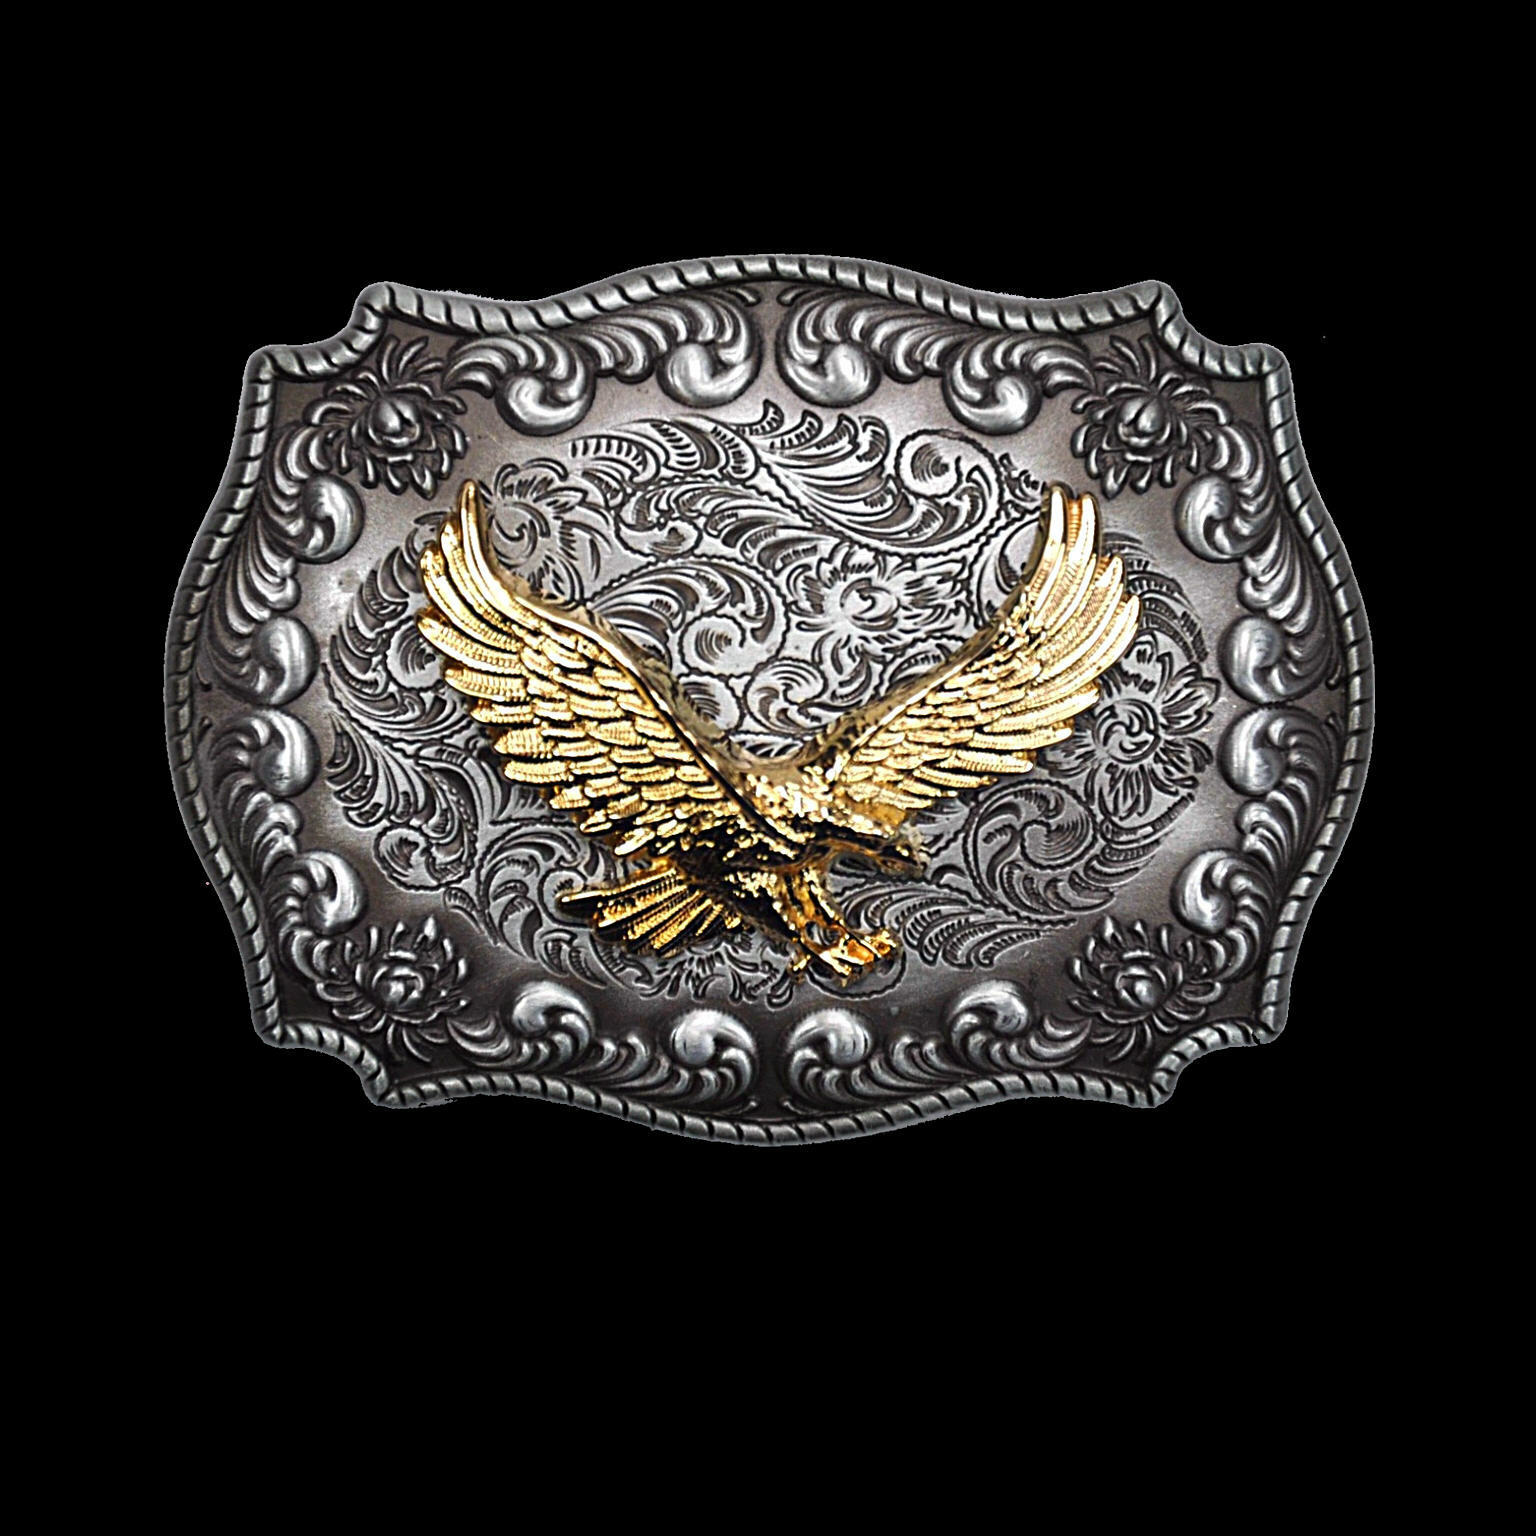 * Buckle Rockabilly Western Cowboy Gürtelschnalle Belt Buckle Gürtel *532